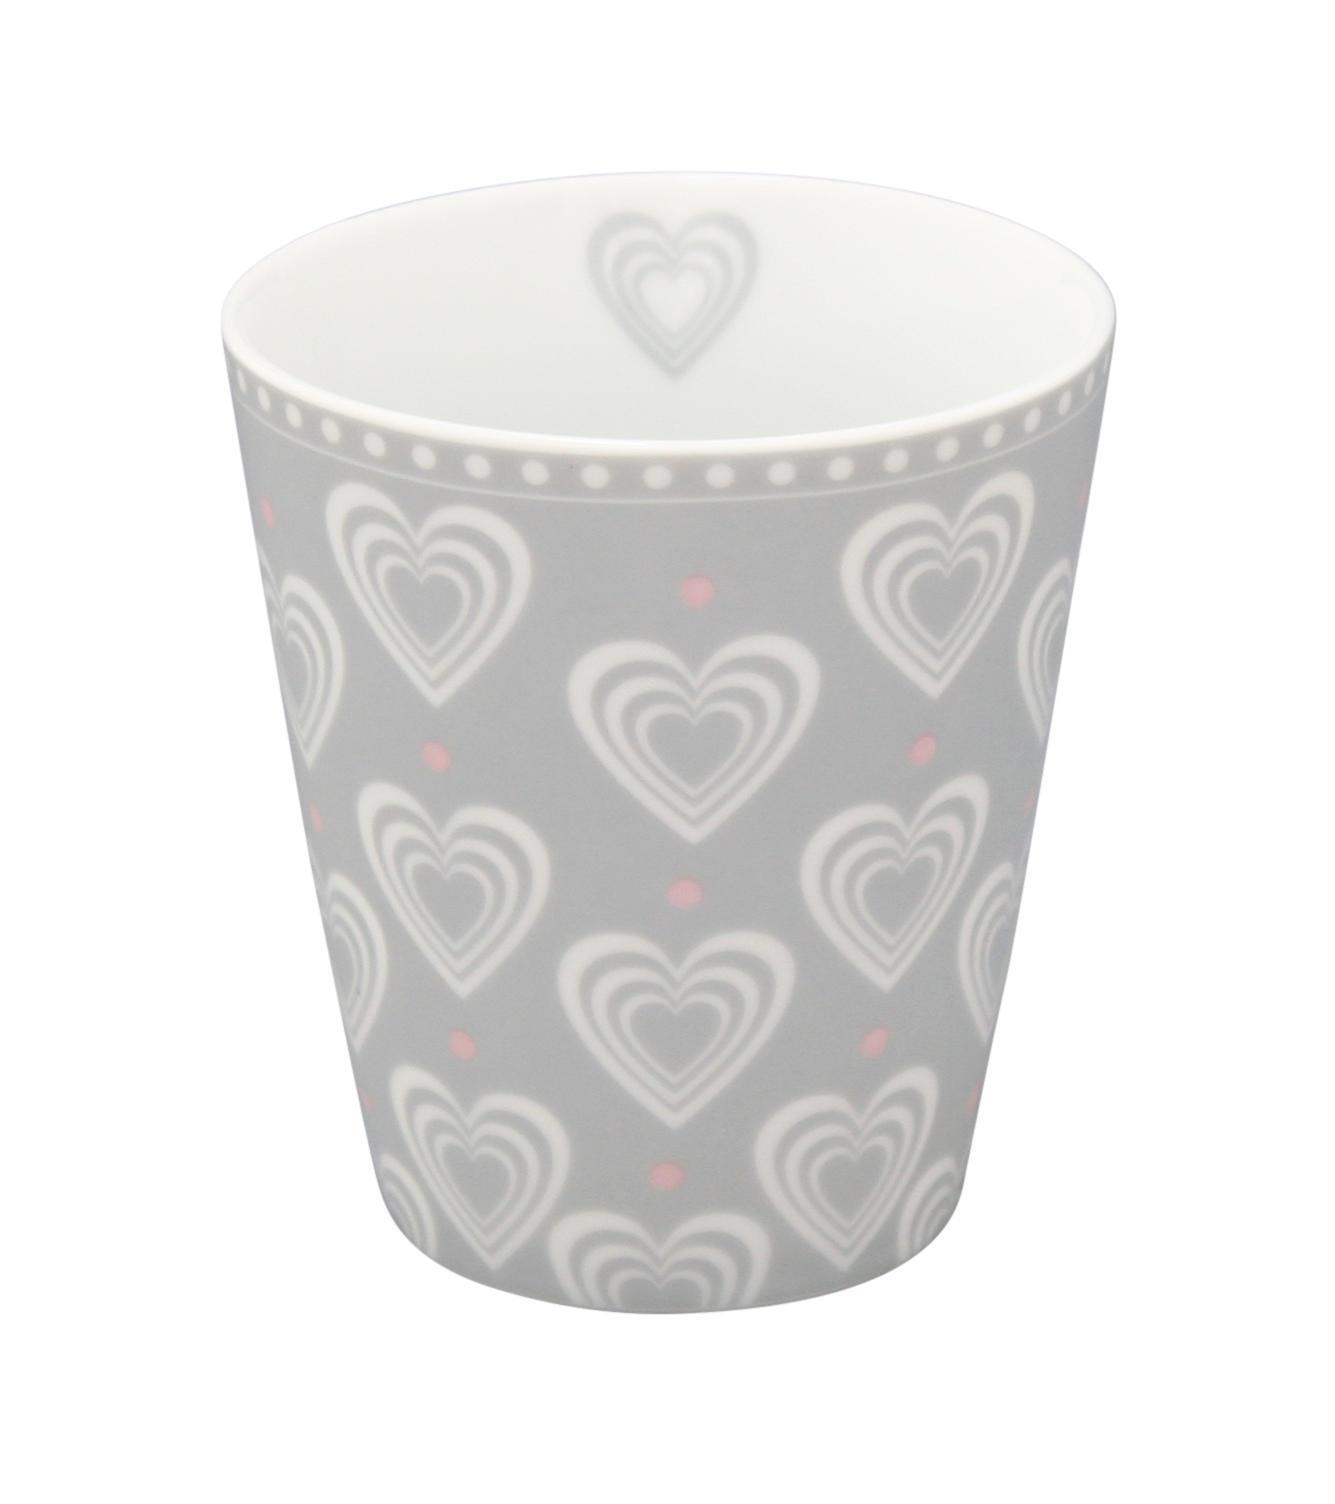 Krasilnikoff Latte hrneček Hearts Grey, šedá barva, porcelán